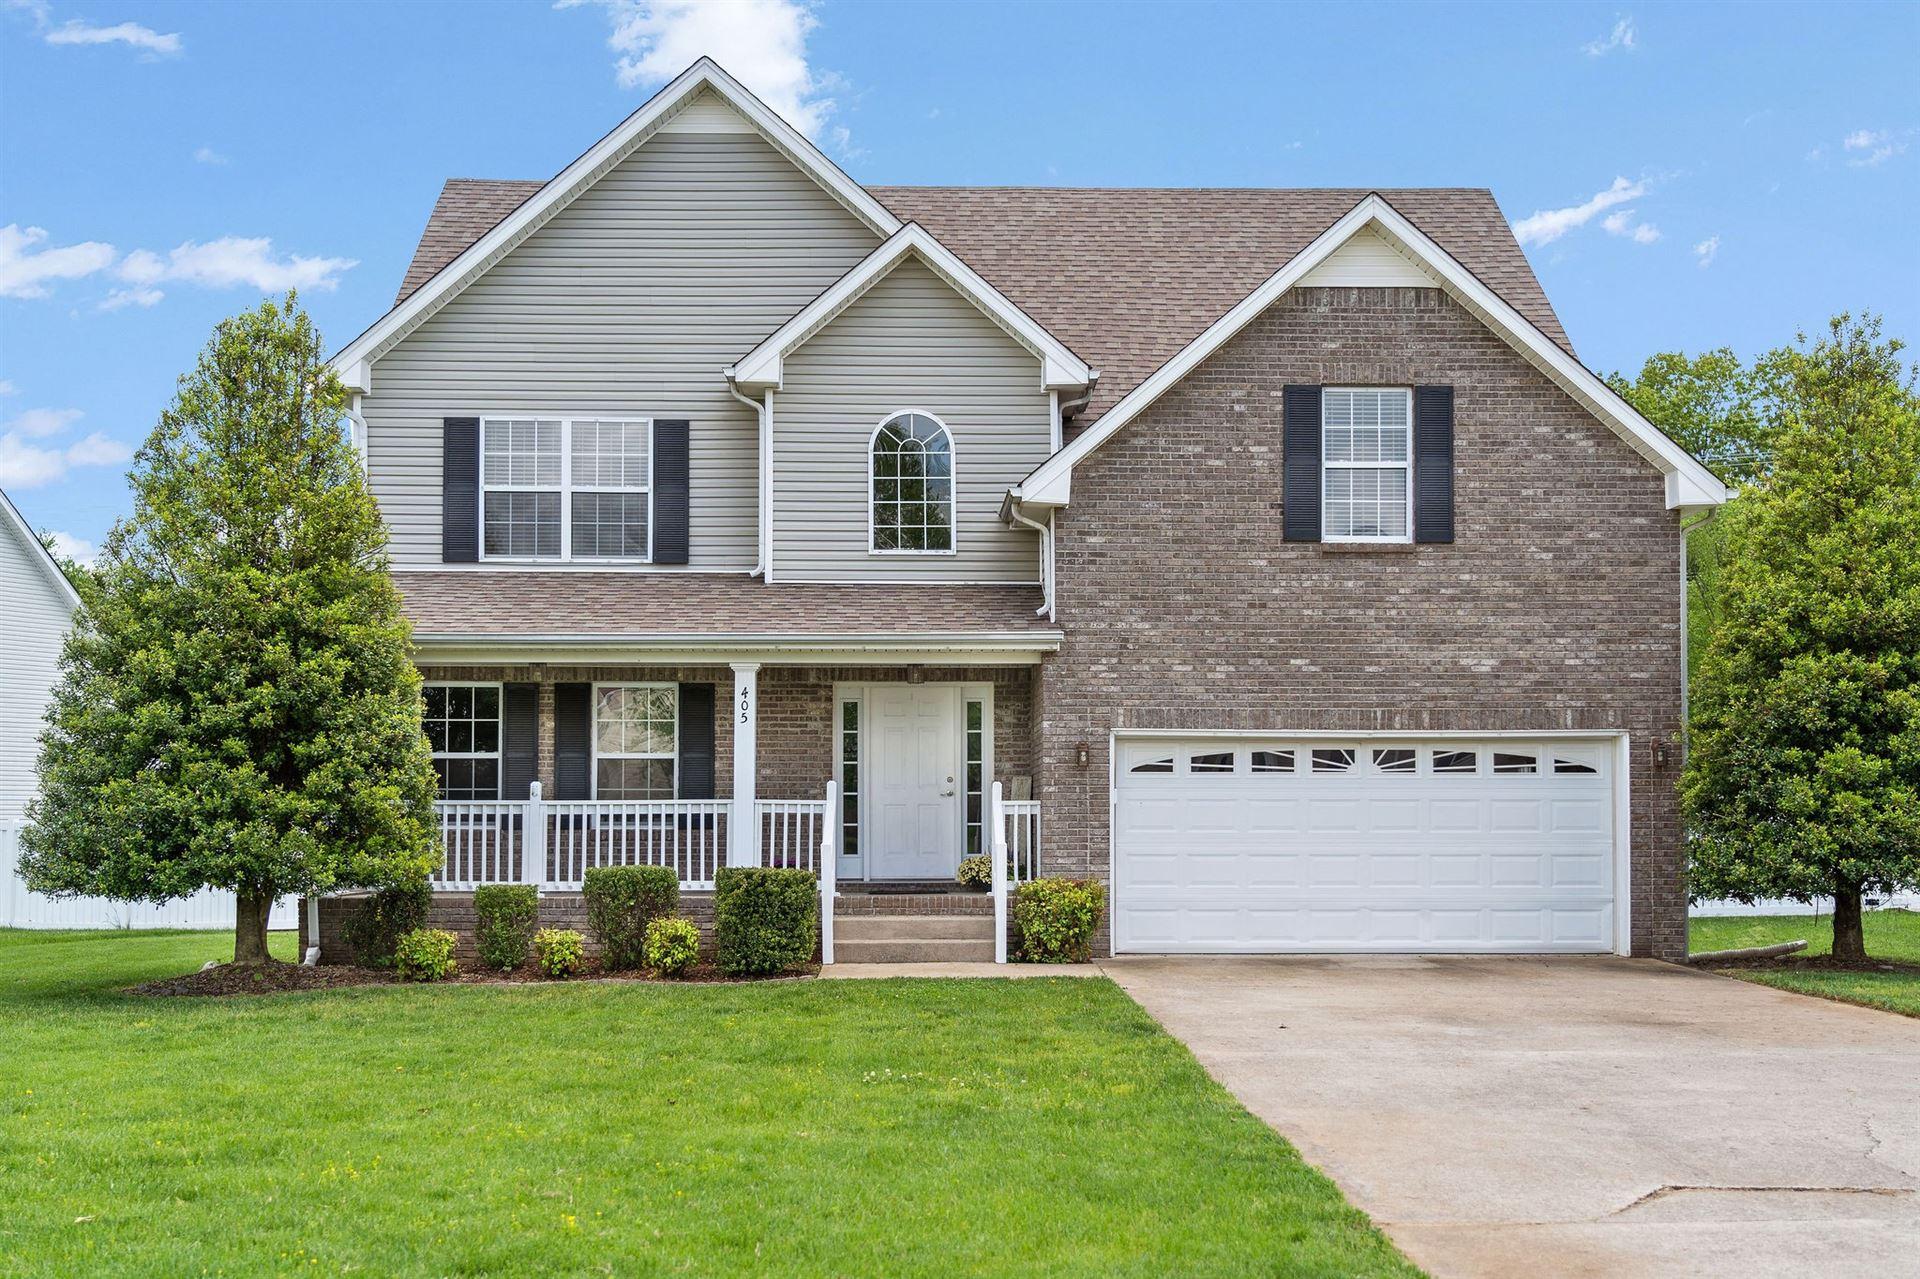 405 Short Bluff Dr, Clarksville, TN 37040 - MLS#: 2245210